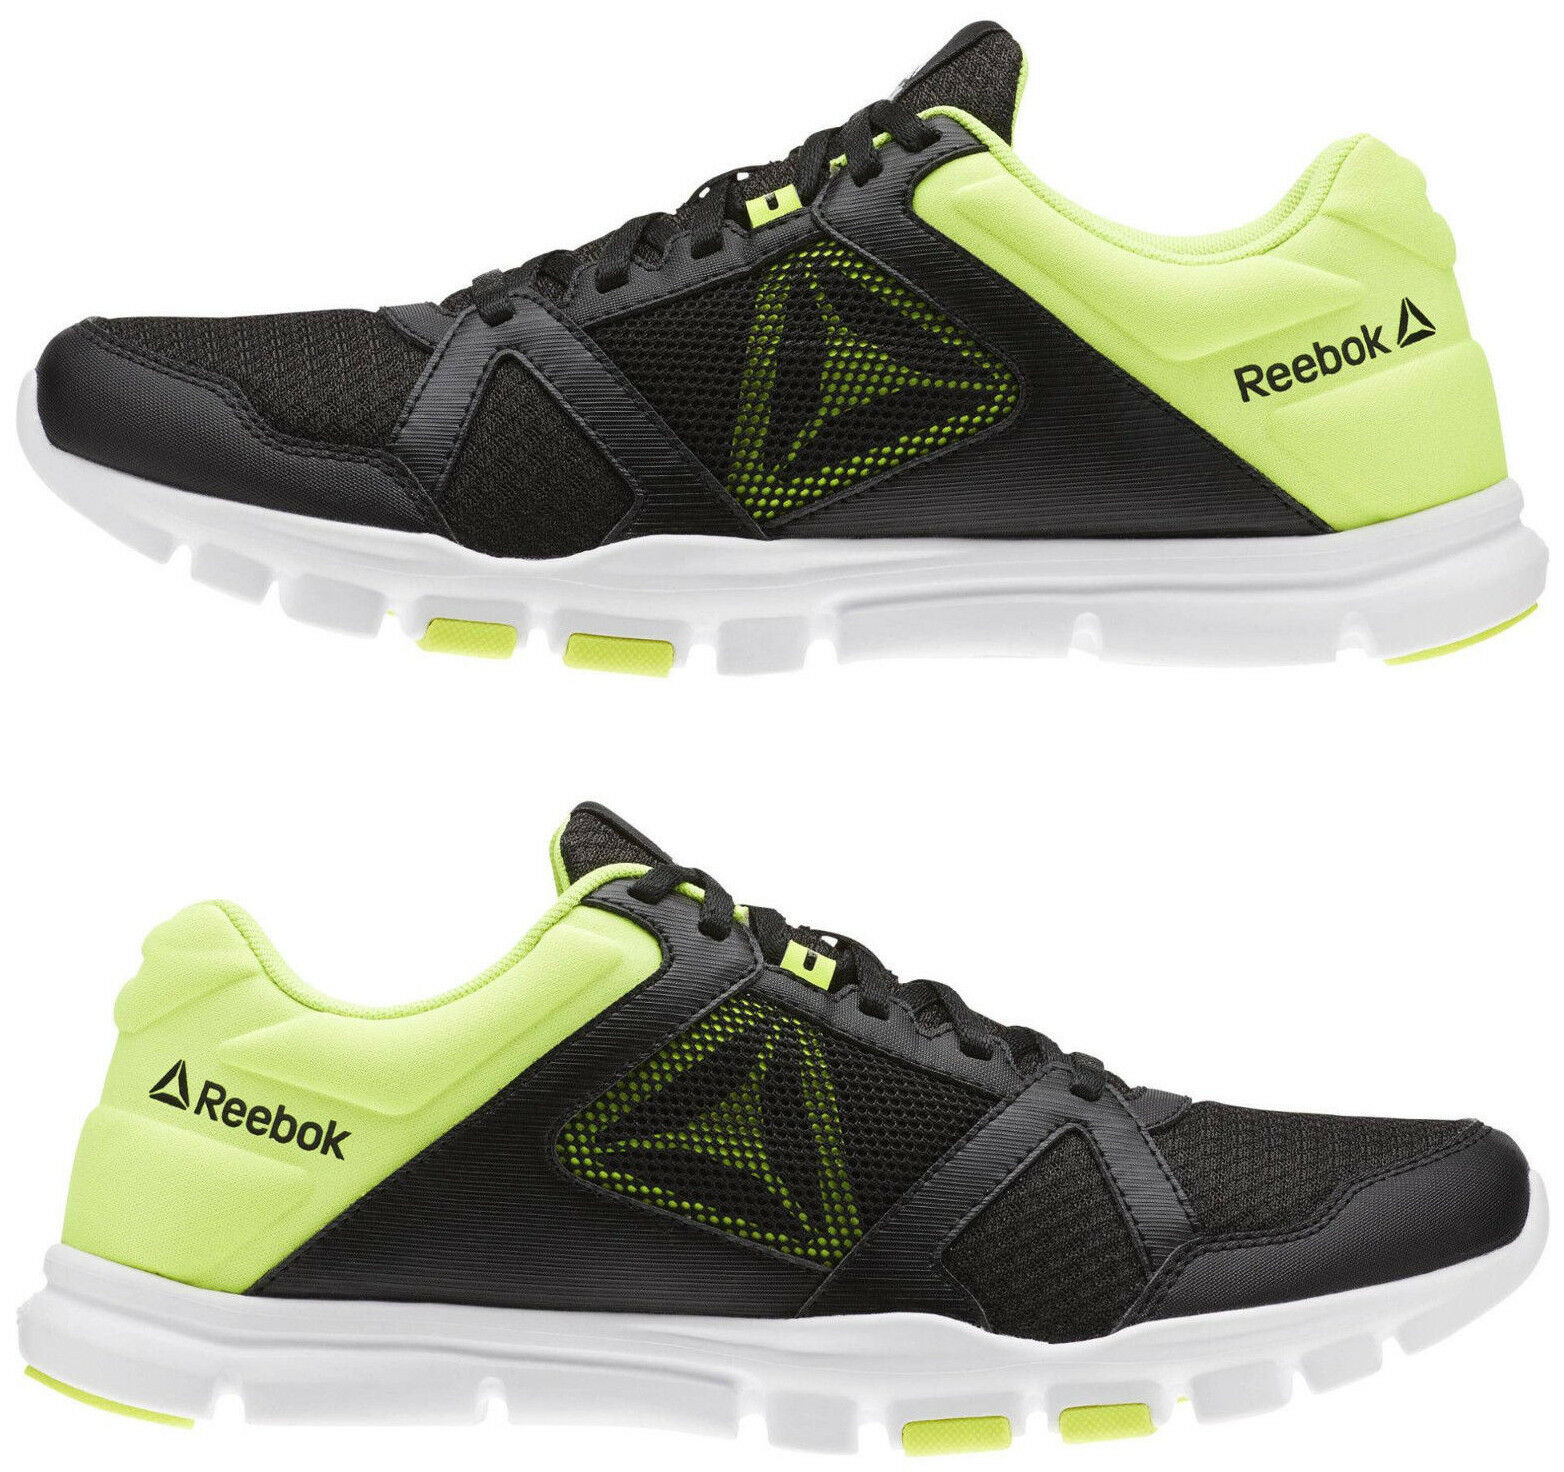 Reebok Men Flexible shoes Gym Training Yourflex Train 10 MT Fitness CN4728 New